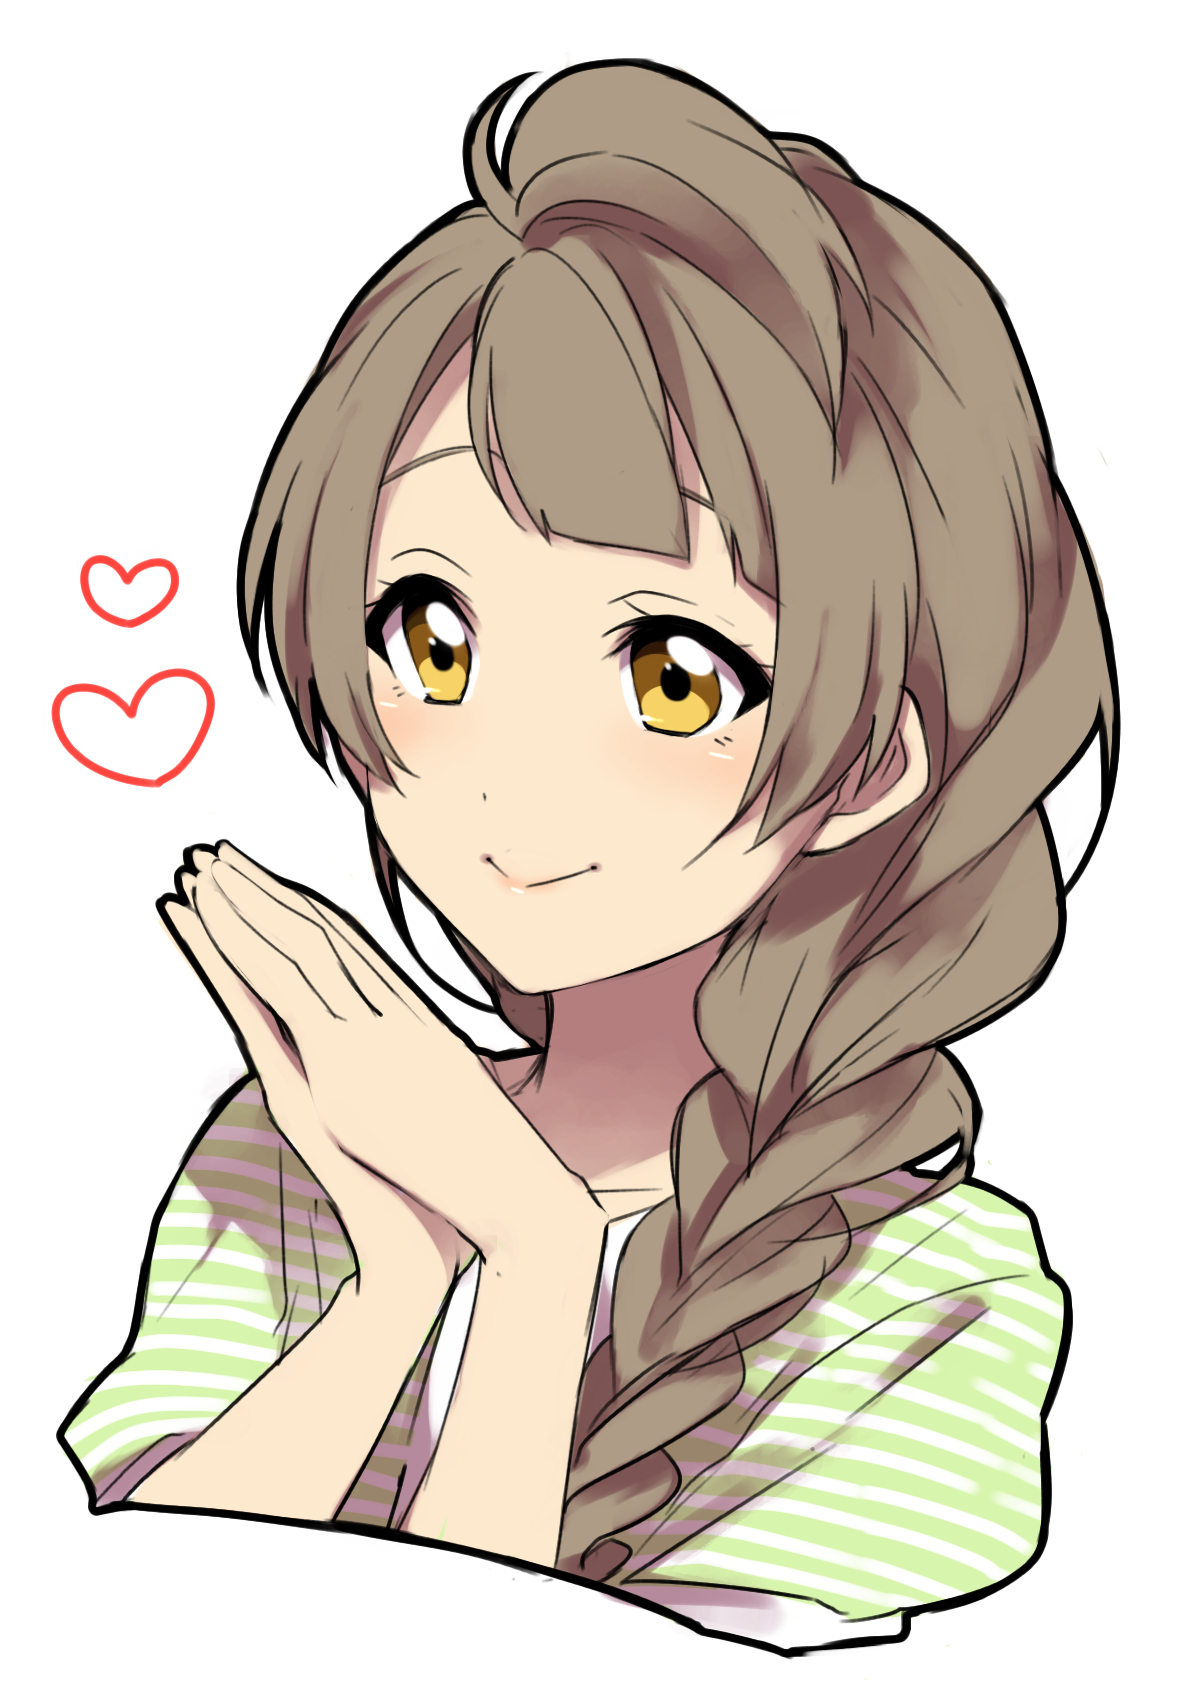 Love live character kotori minami